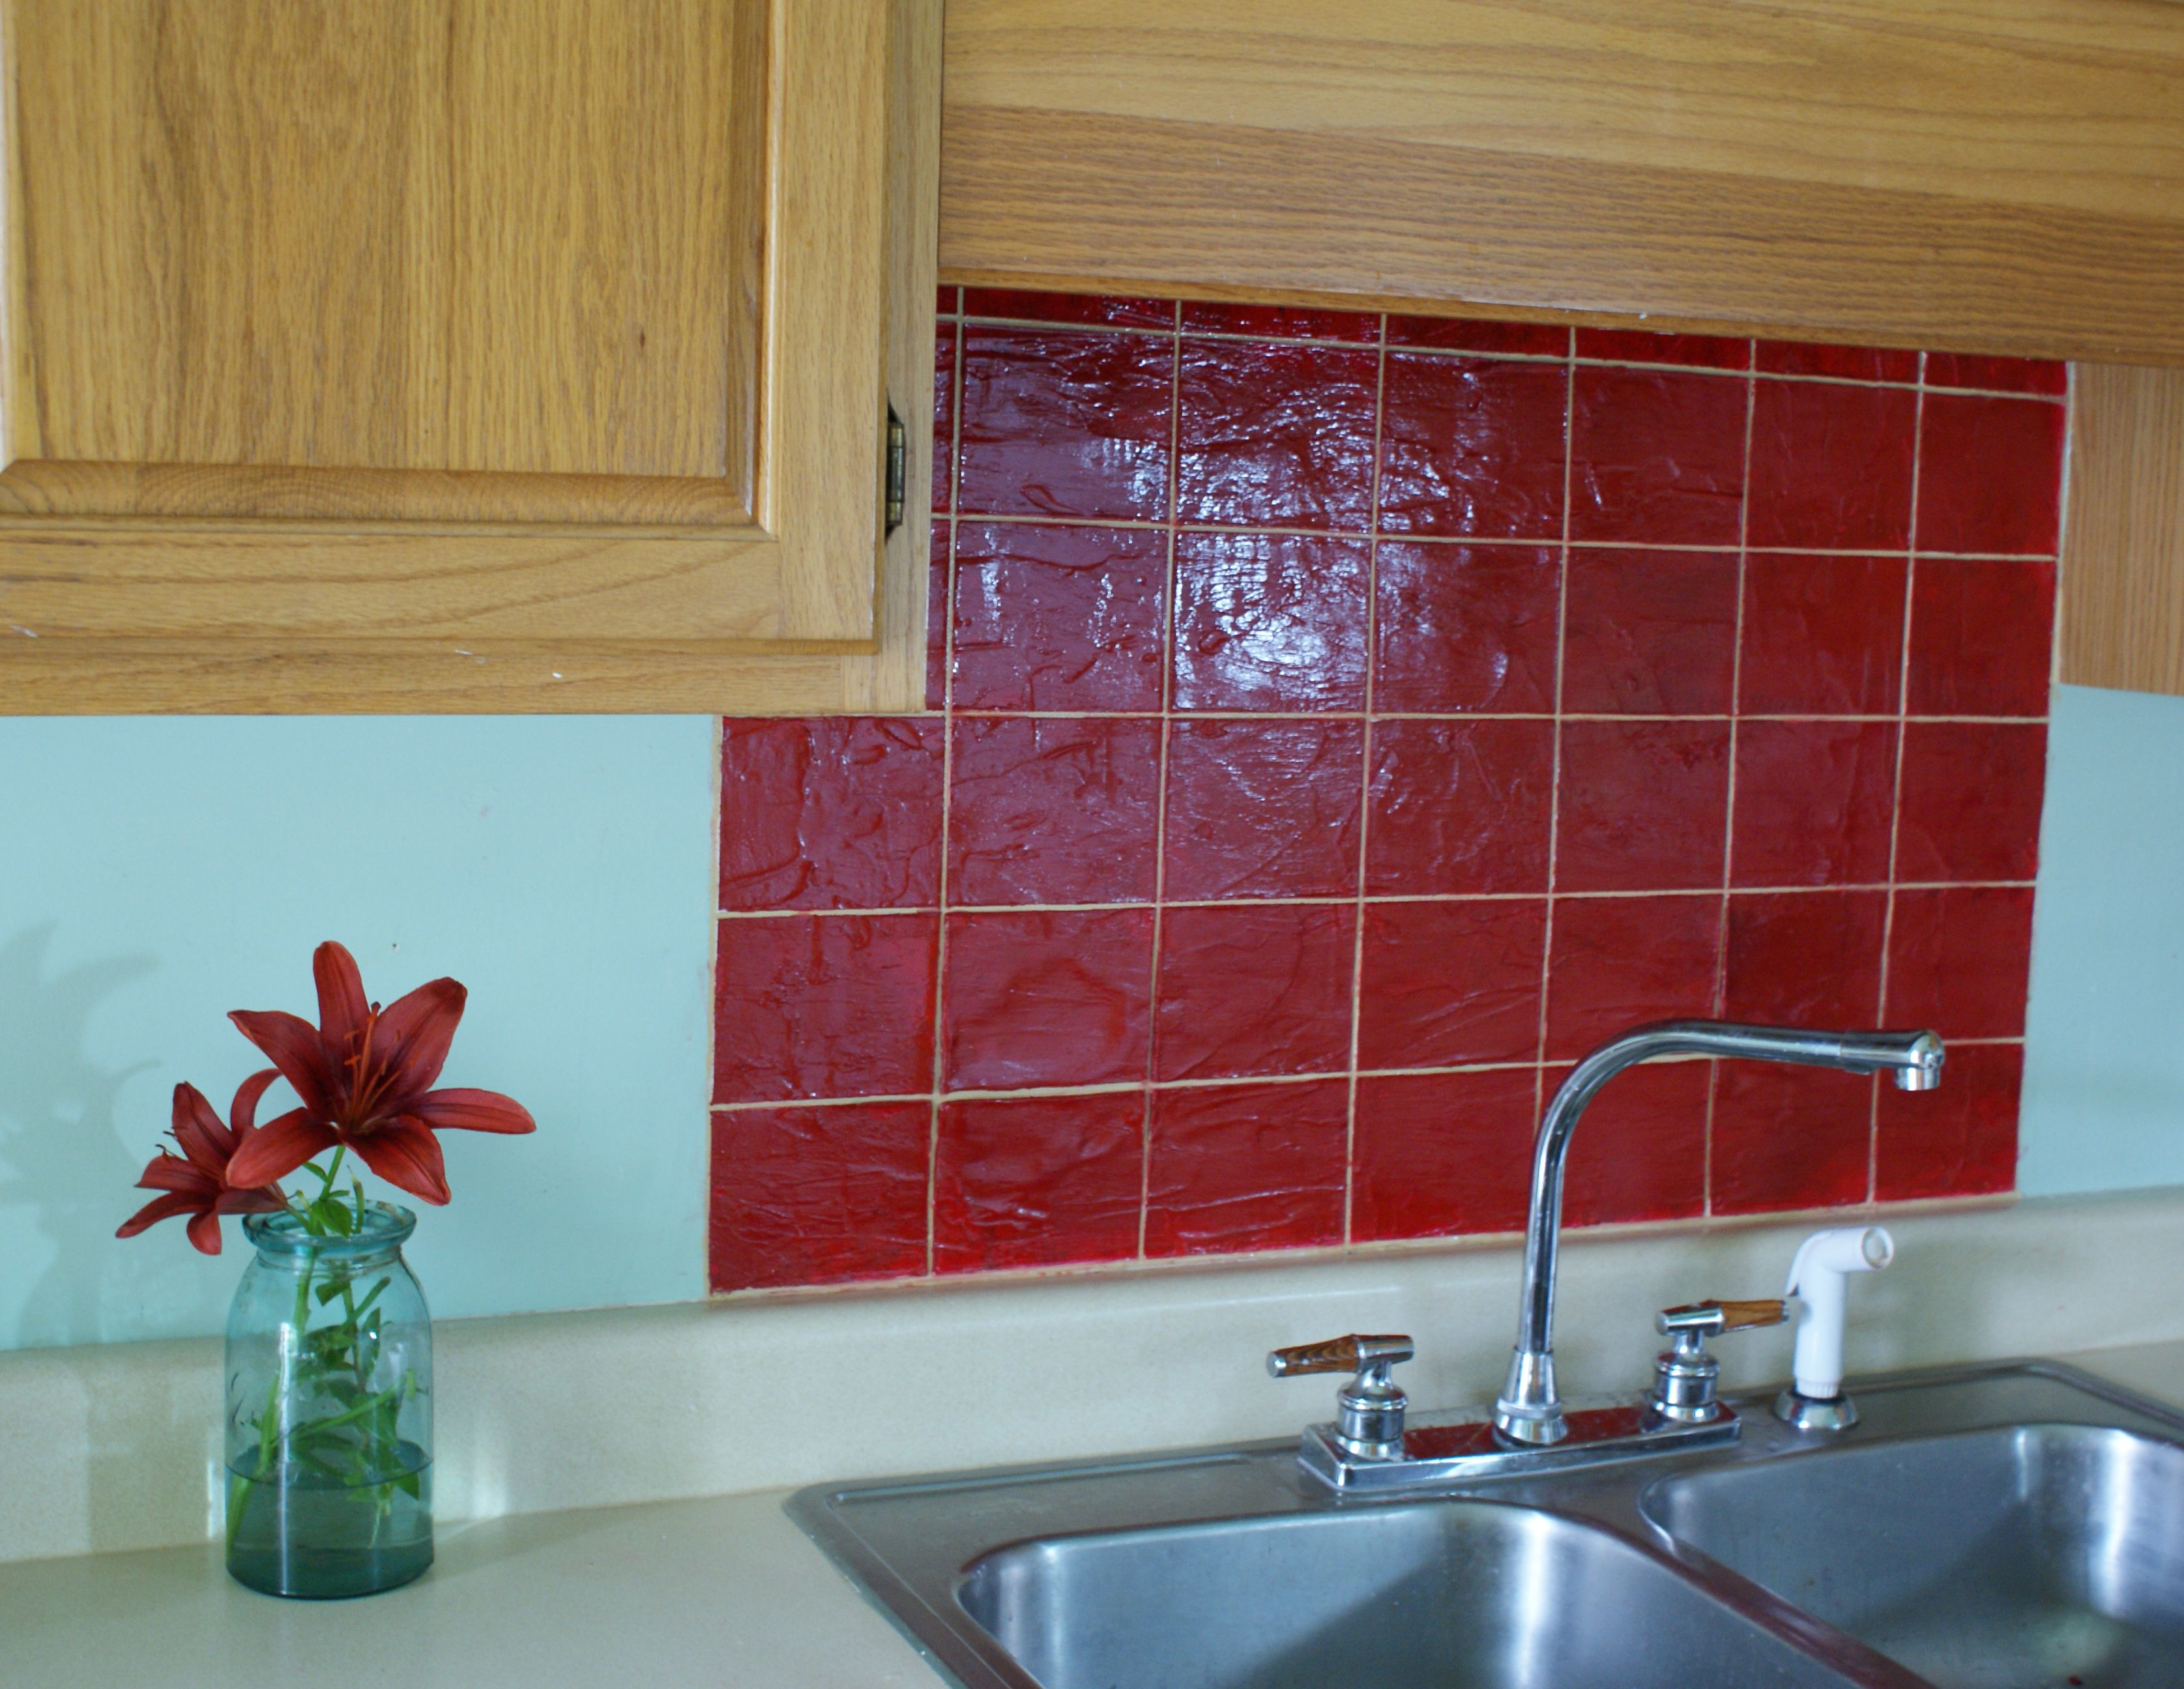 Faux Tile Kitchen Backsplash Faux tiles, Kitchen tiles